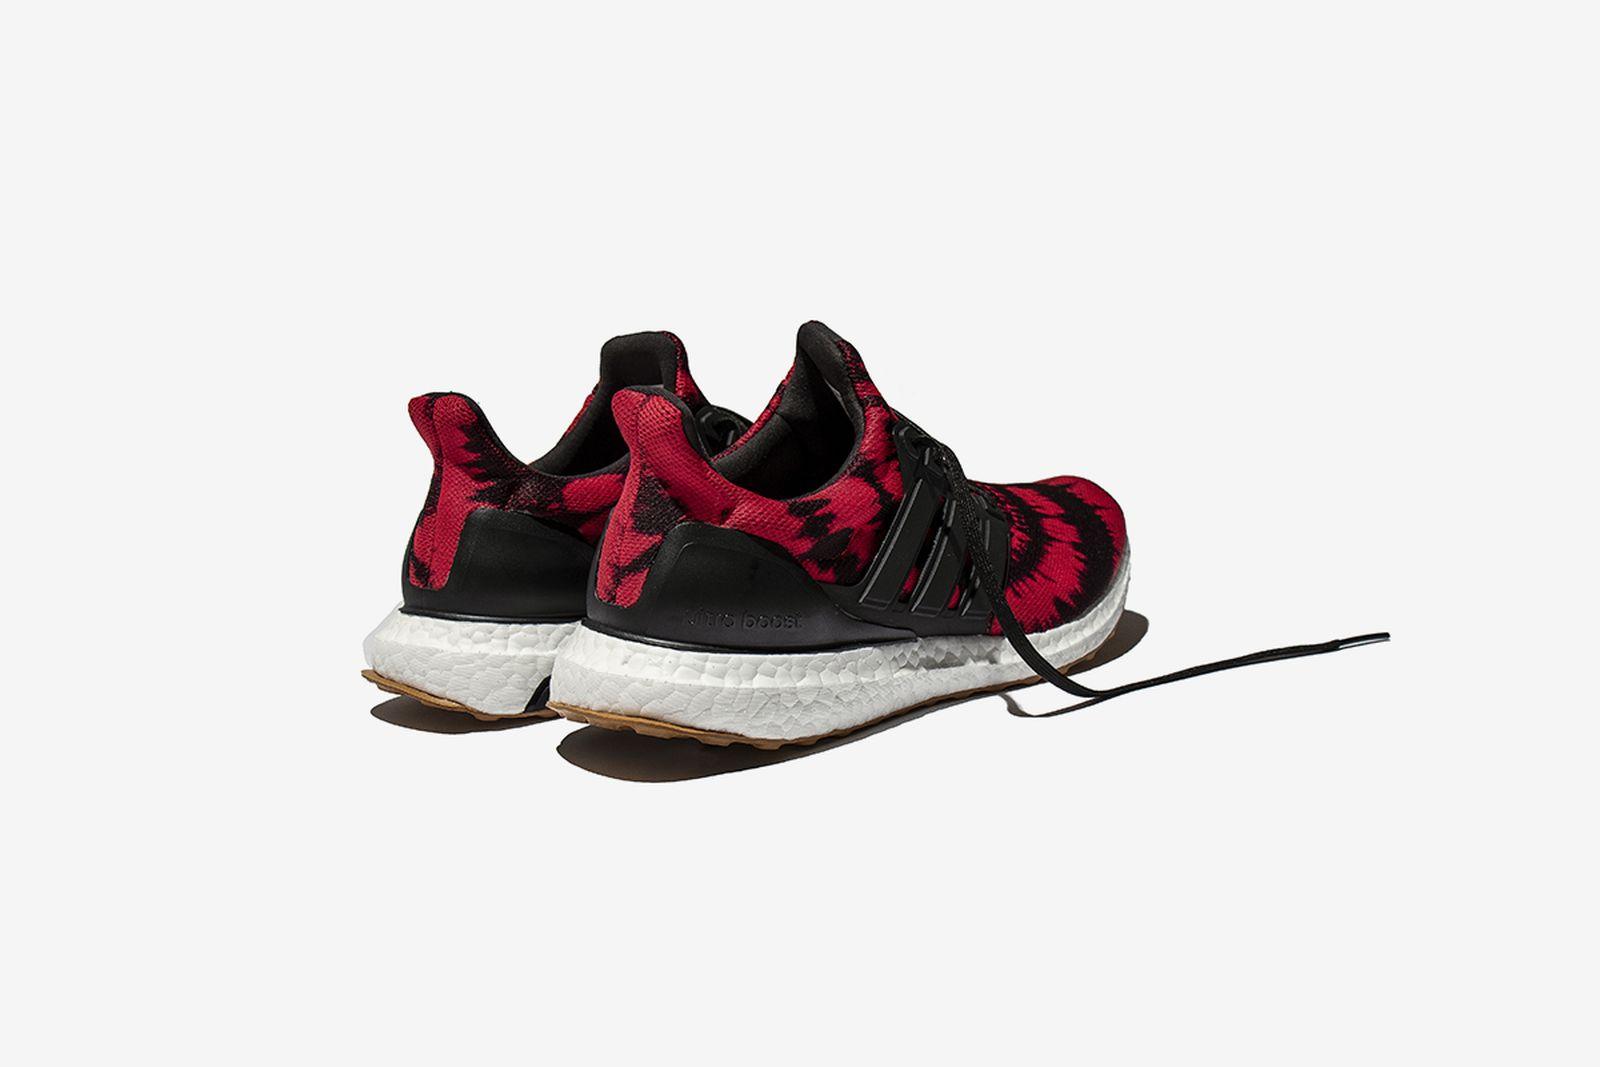 nice-kicks-adidas-ultraboost-no-vacancy-release-date-price-1-02